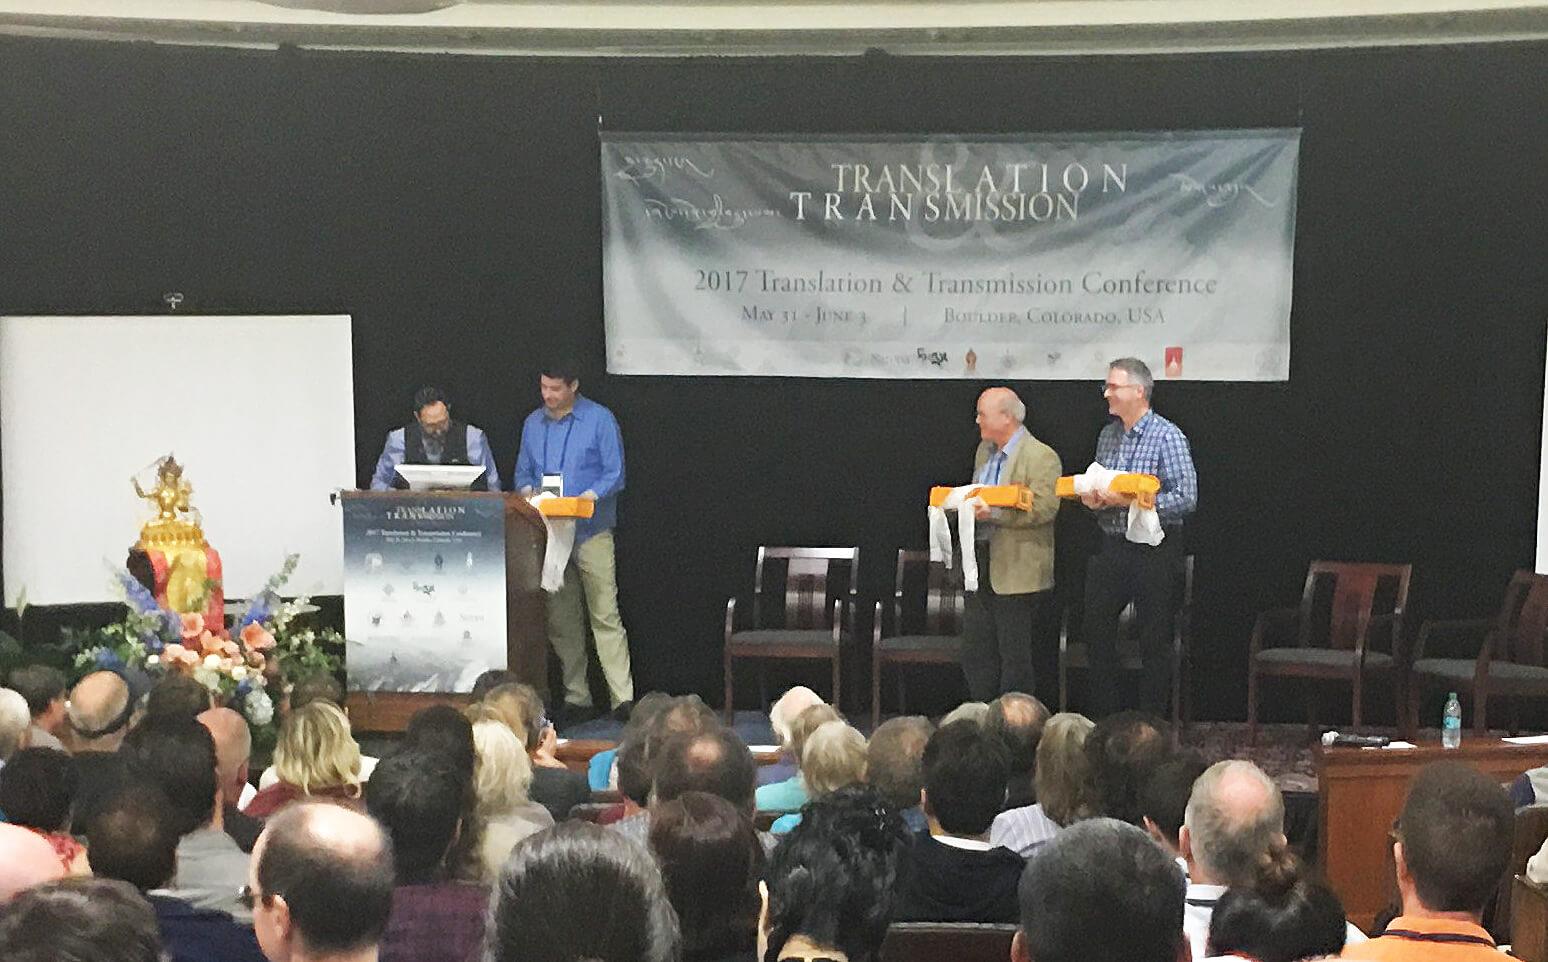 Padmakara Translation Group Receives the 2017 Shantarakshita Award